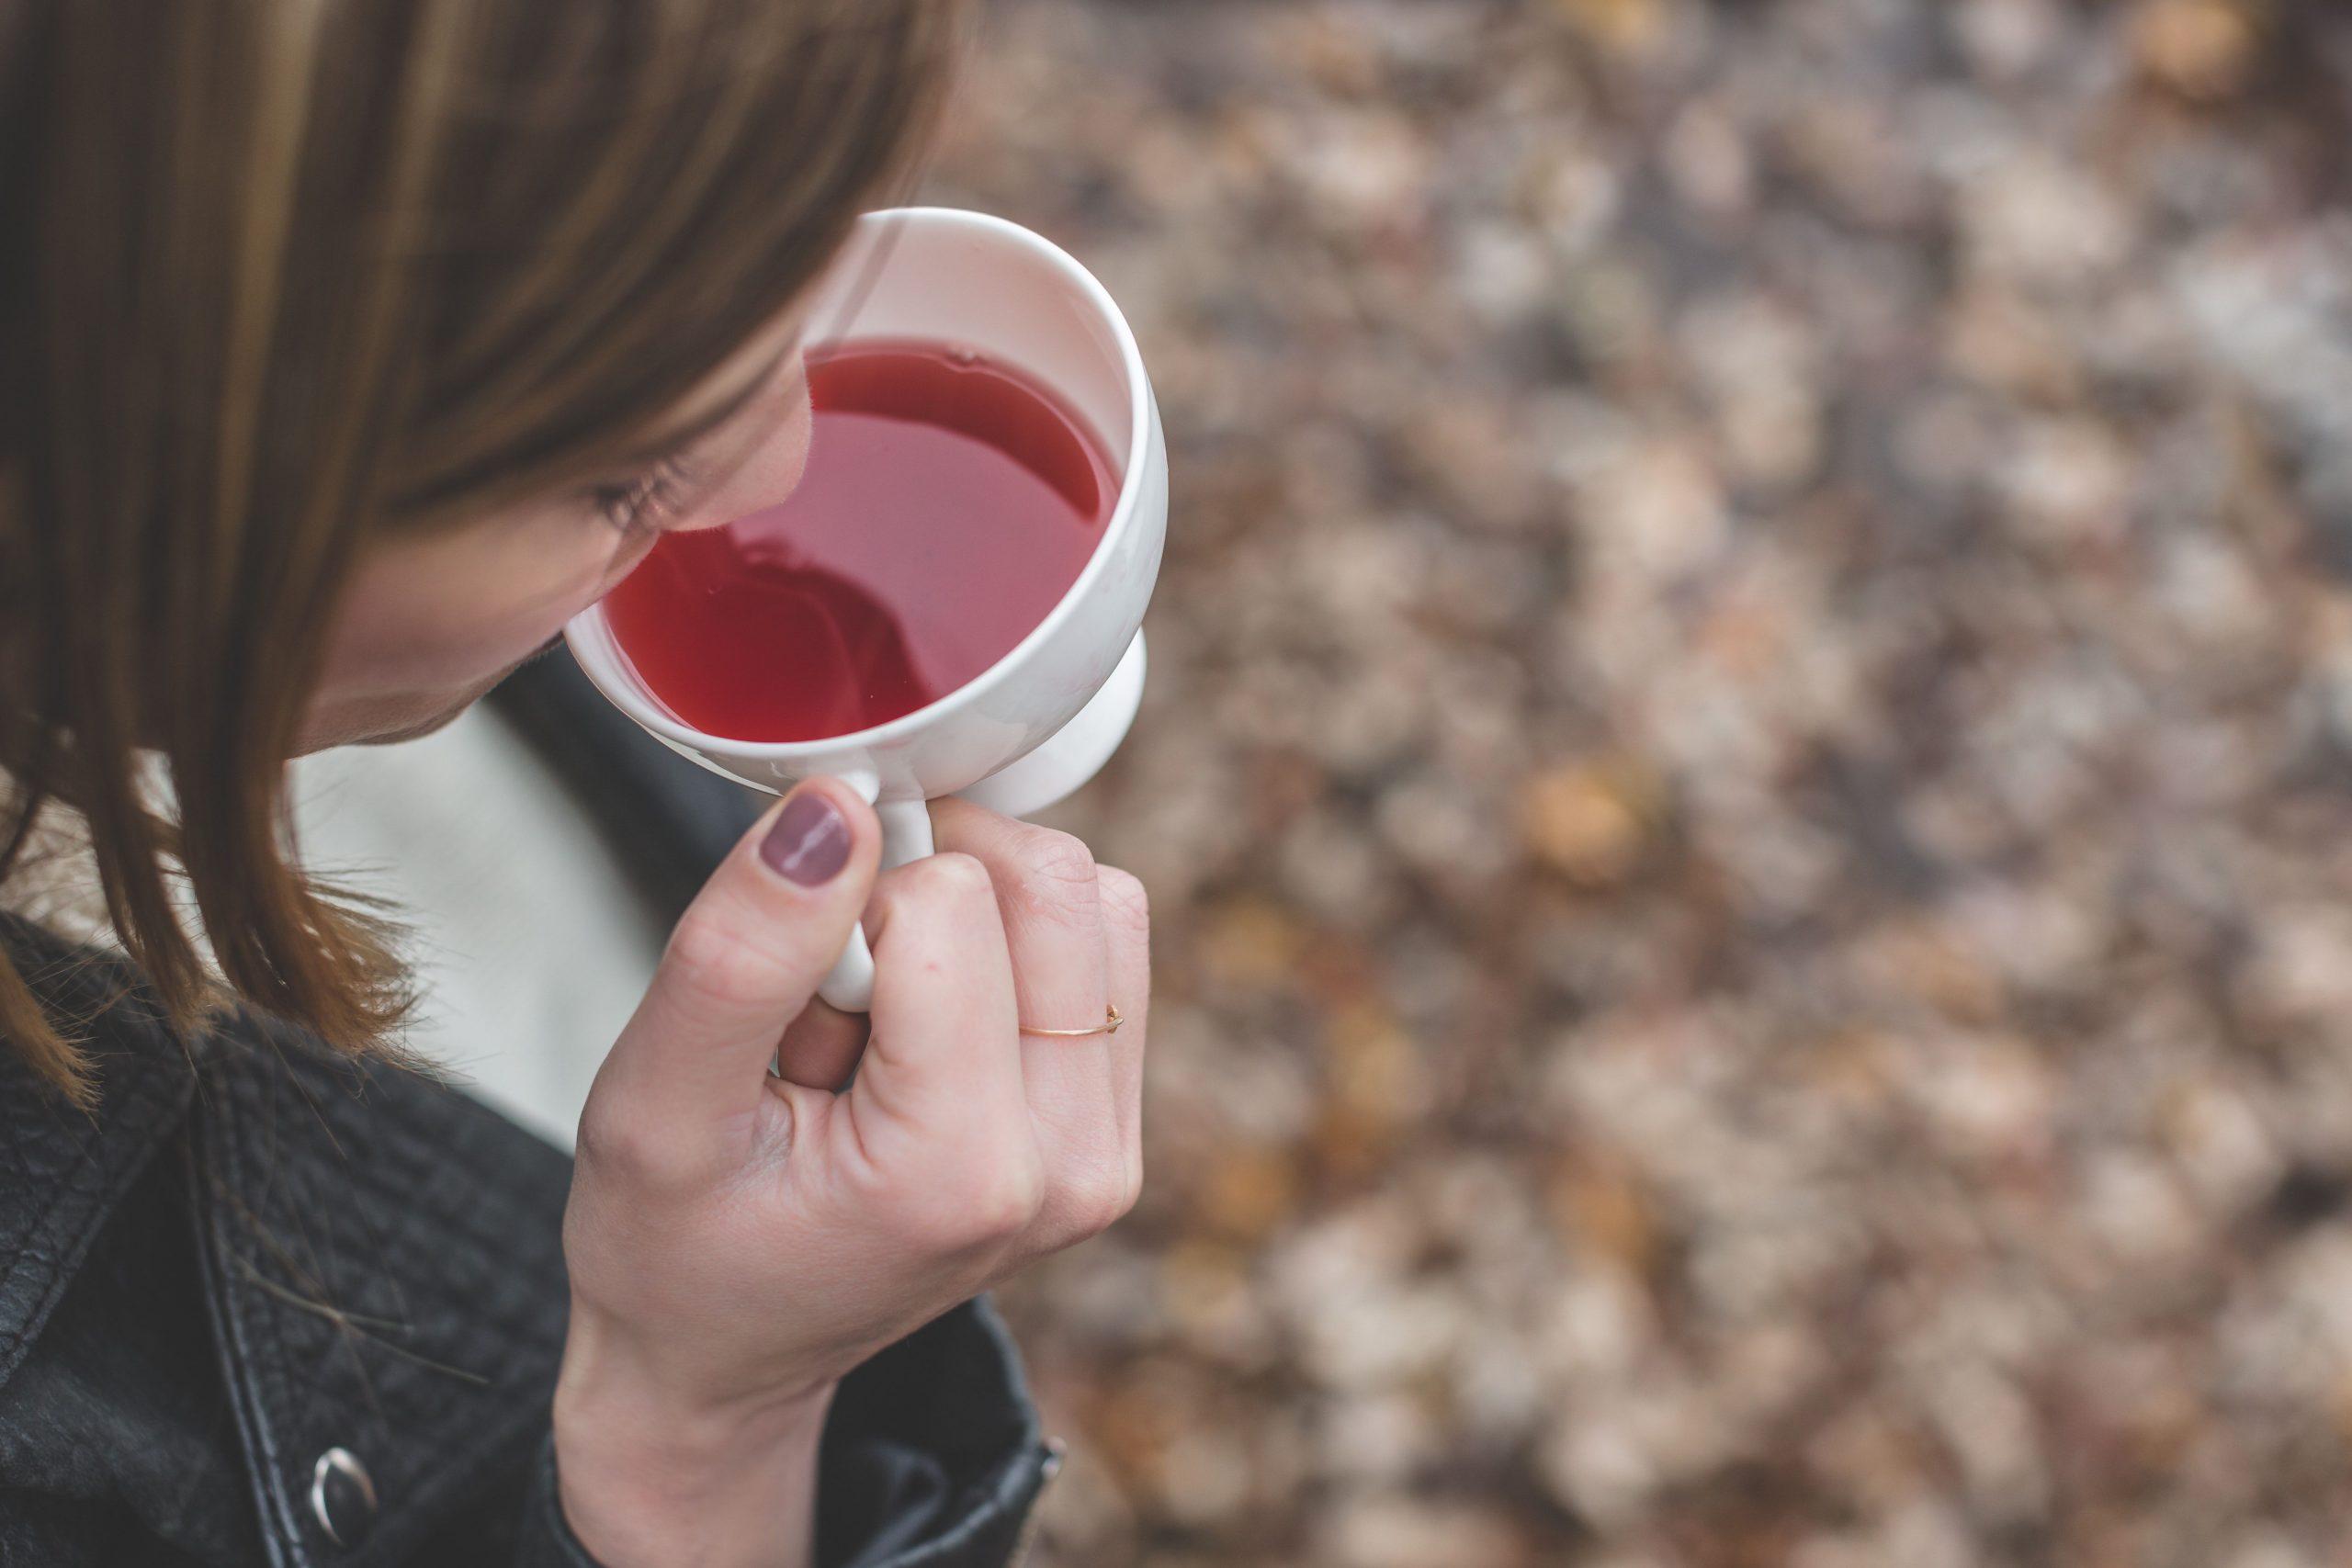 caffeine cup drink hot 374605 scaled 熱門母親節必送, 養顏美容茶, 必喝茶款, 檸檬茶, 檸檬茶養顏美容, 母親節送茶, 母親節推薦